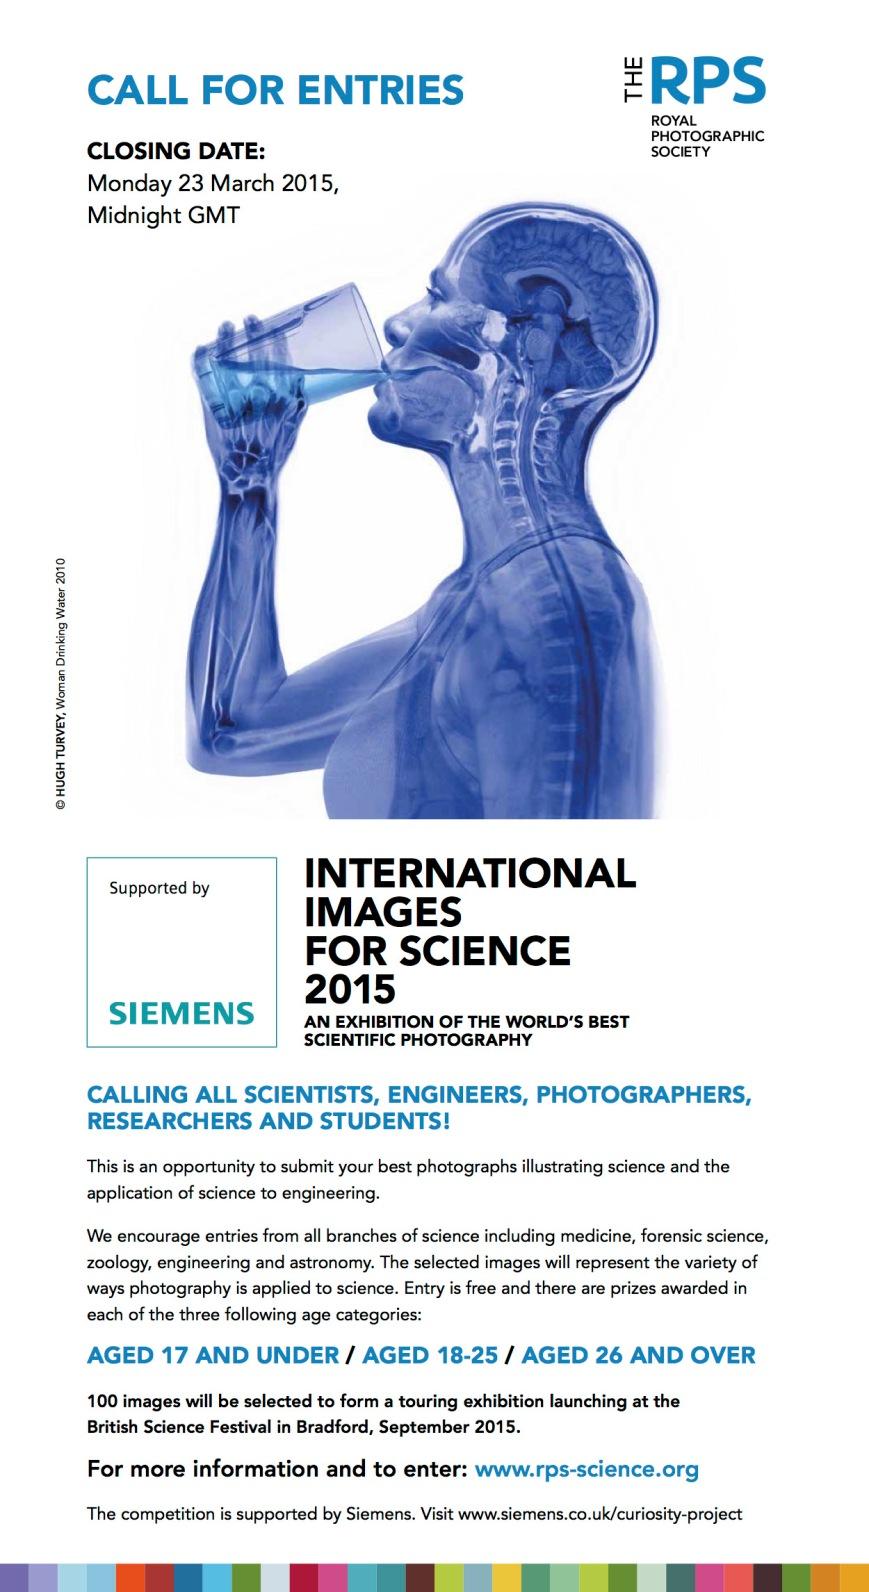 International Images for Science 2015 e-flyer